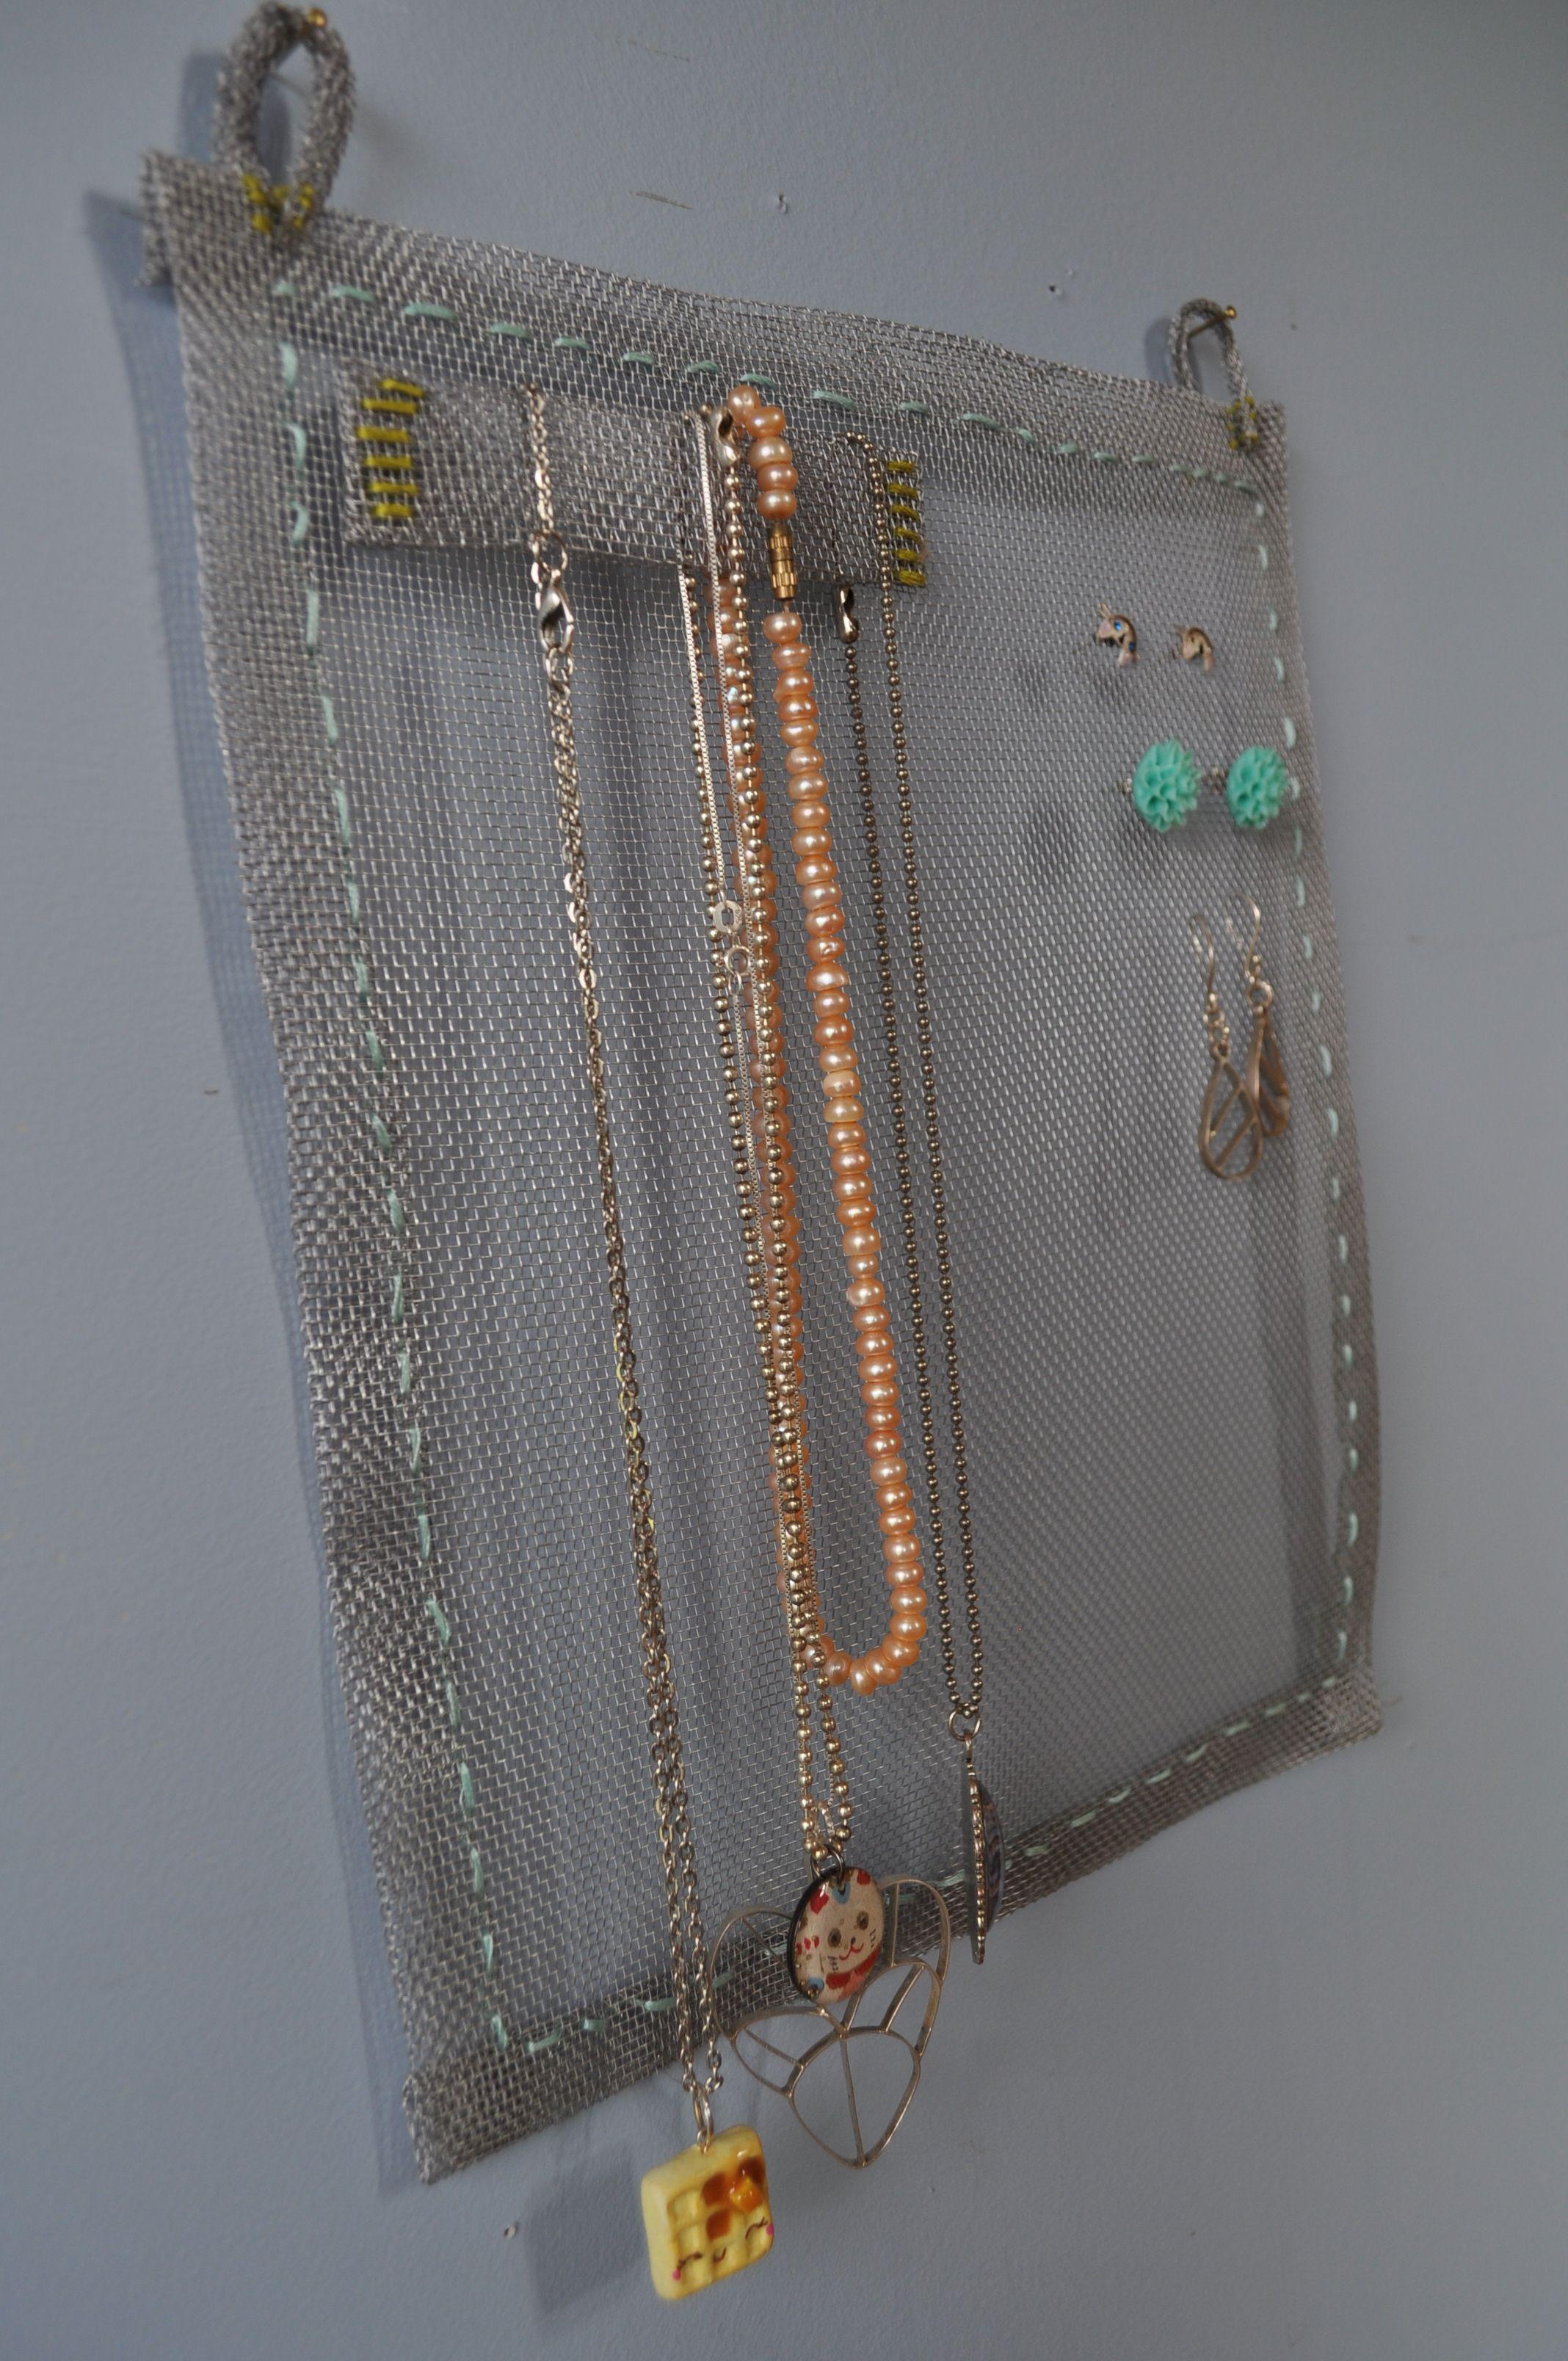 Hand Sewn Window Screen Jewelry Organizer You Craft Me Up